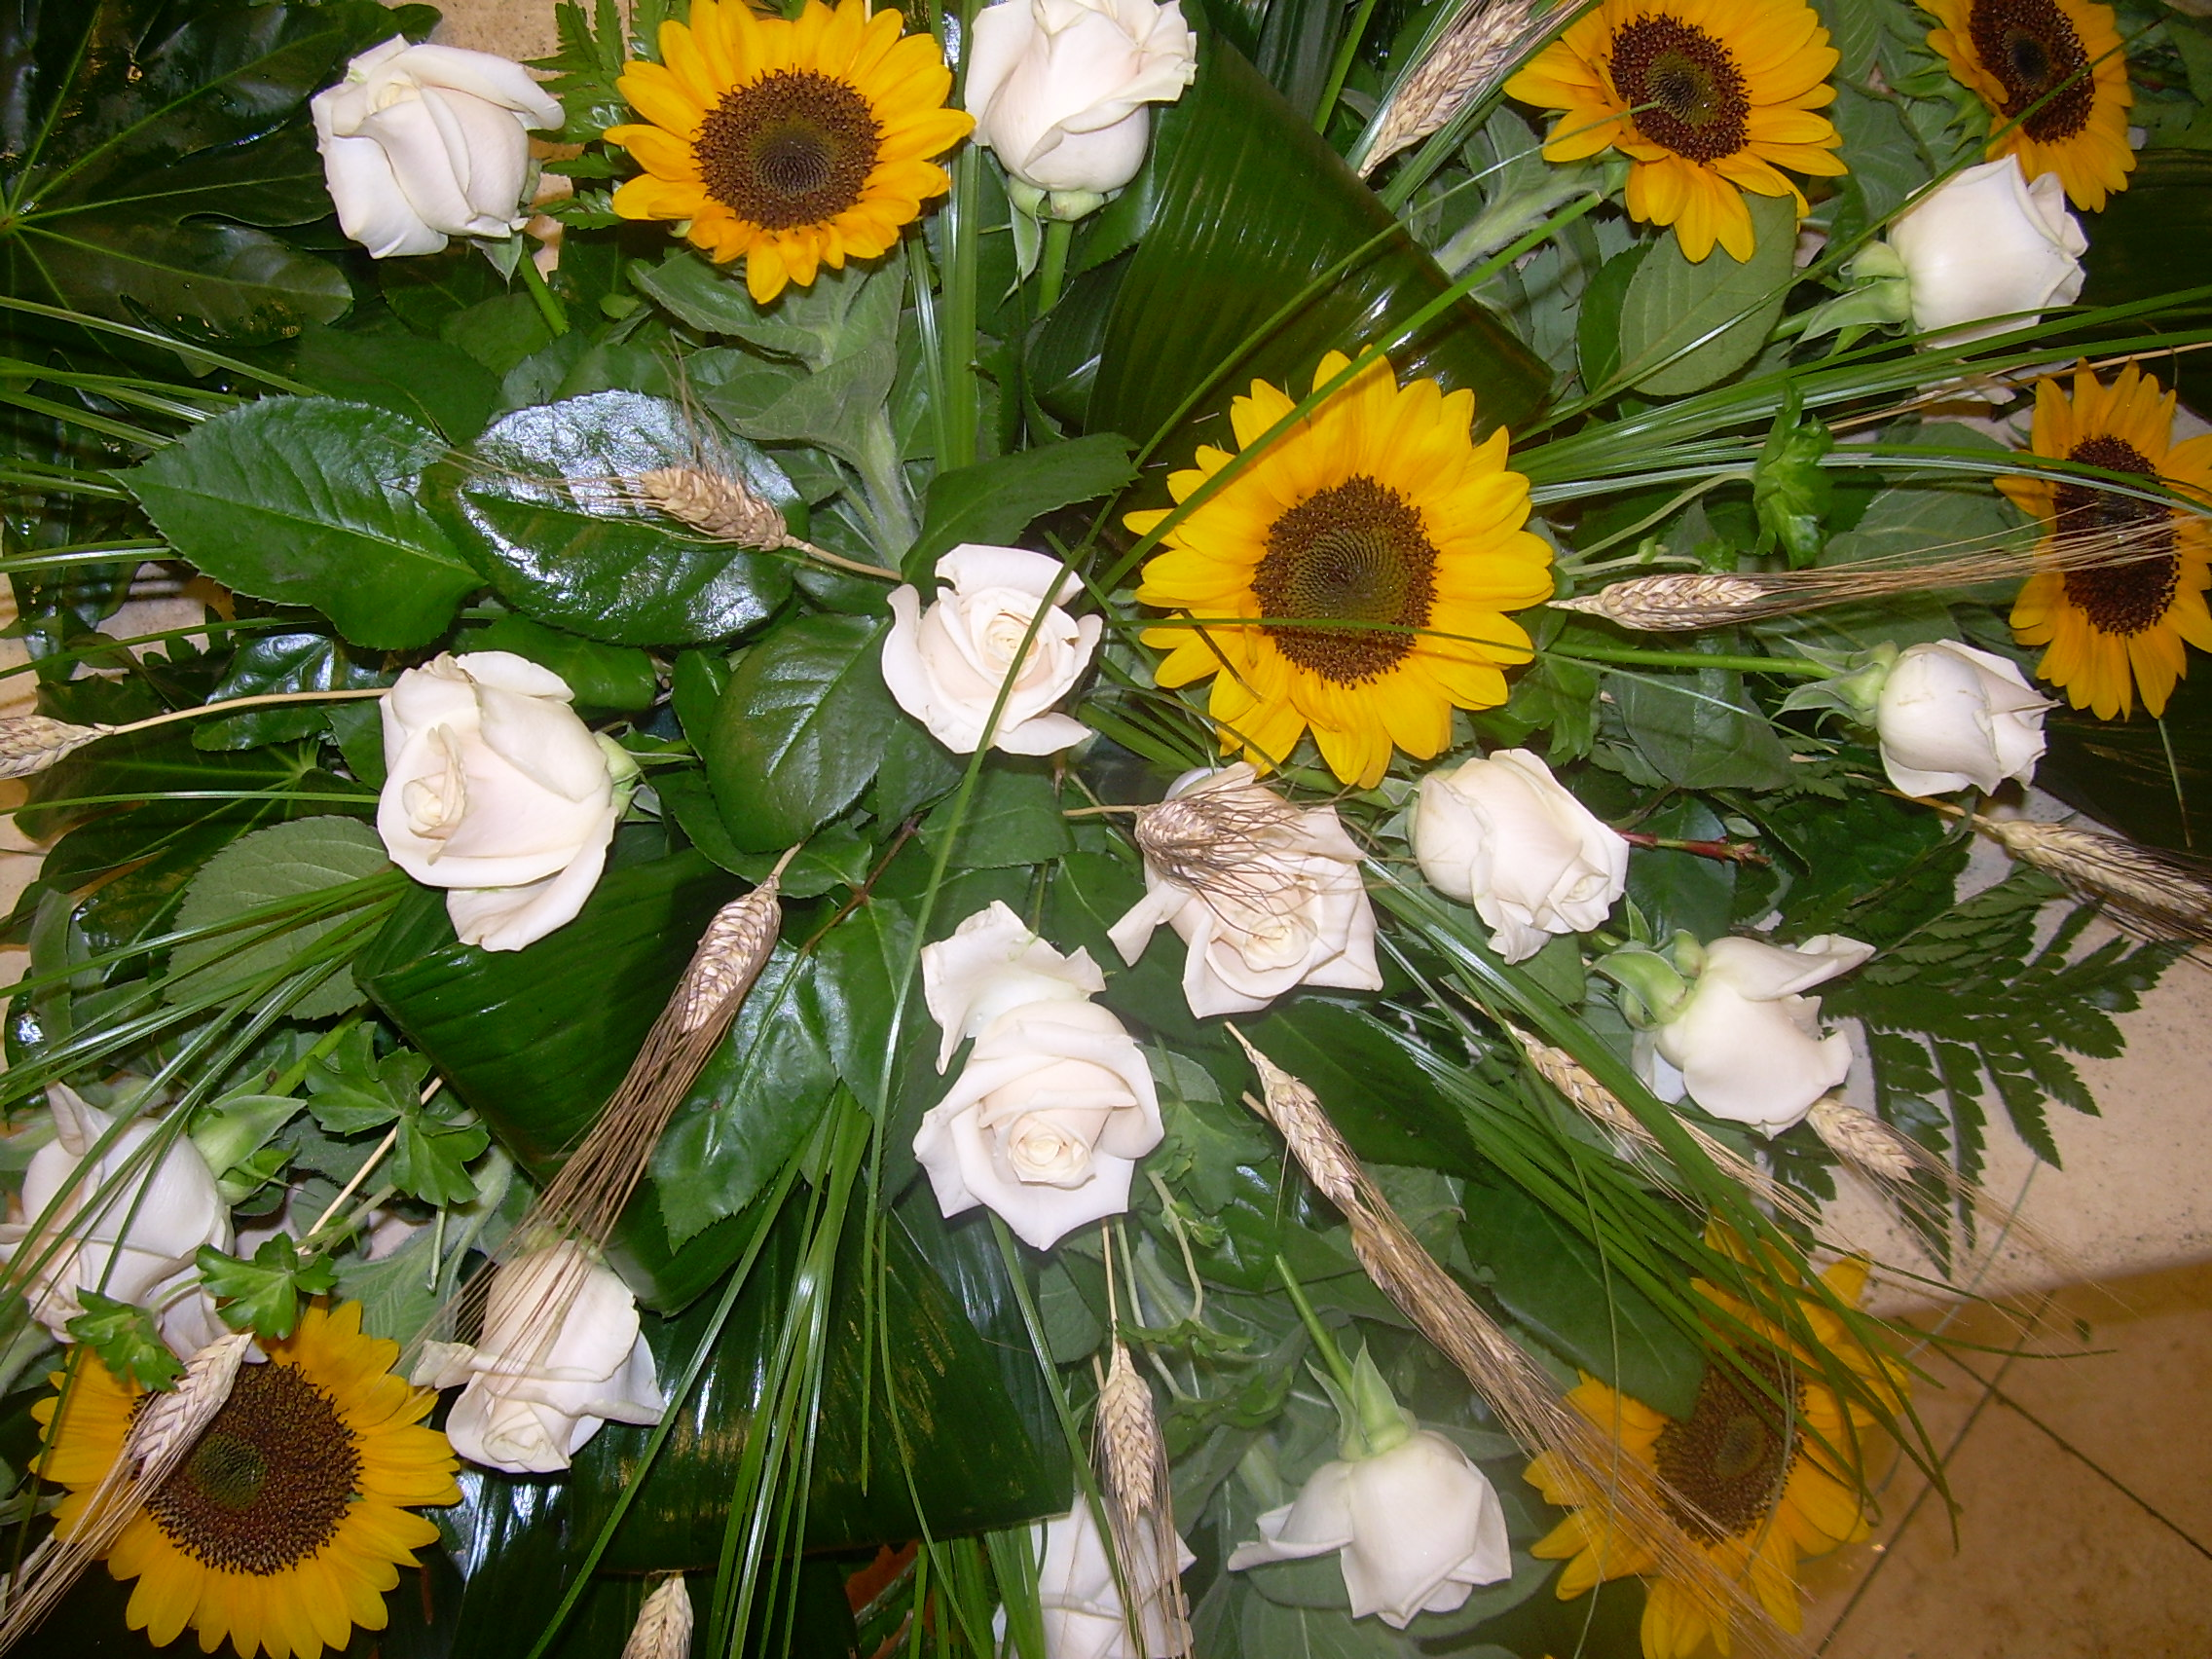 Centrotavola Con Girasoli Matrimonio : Elisabetta fiori e piante centrotavola cadente con rose